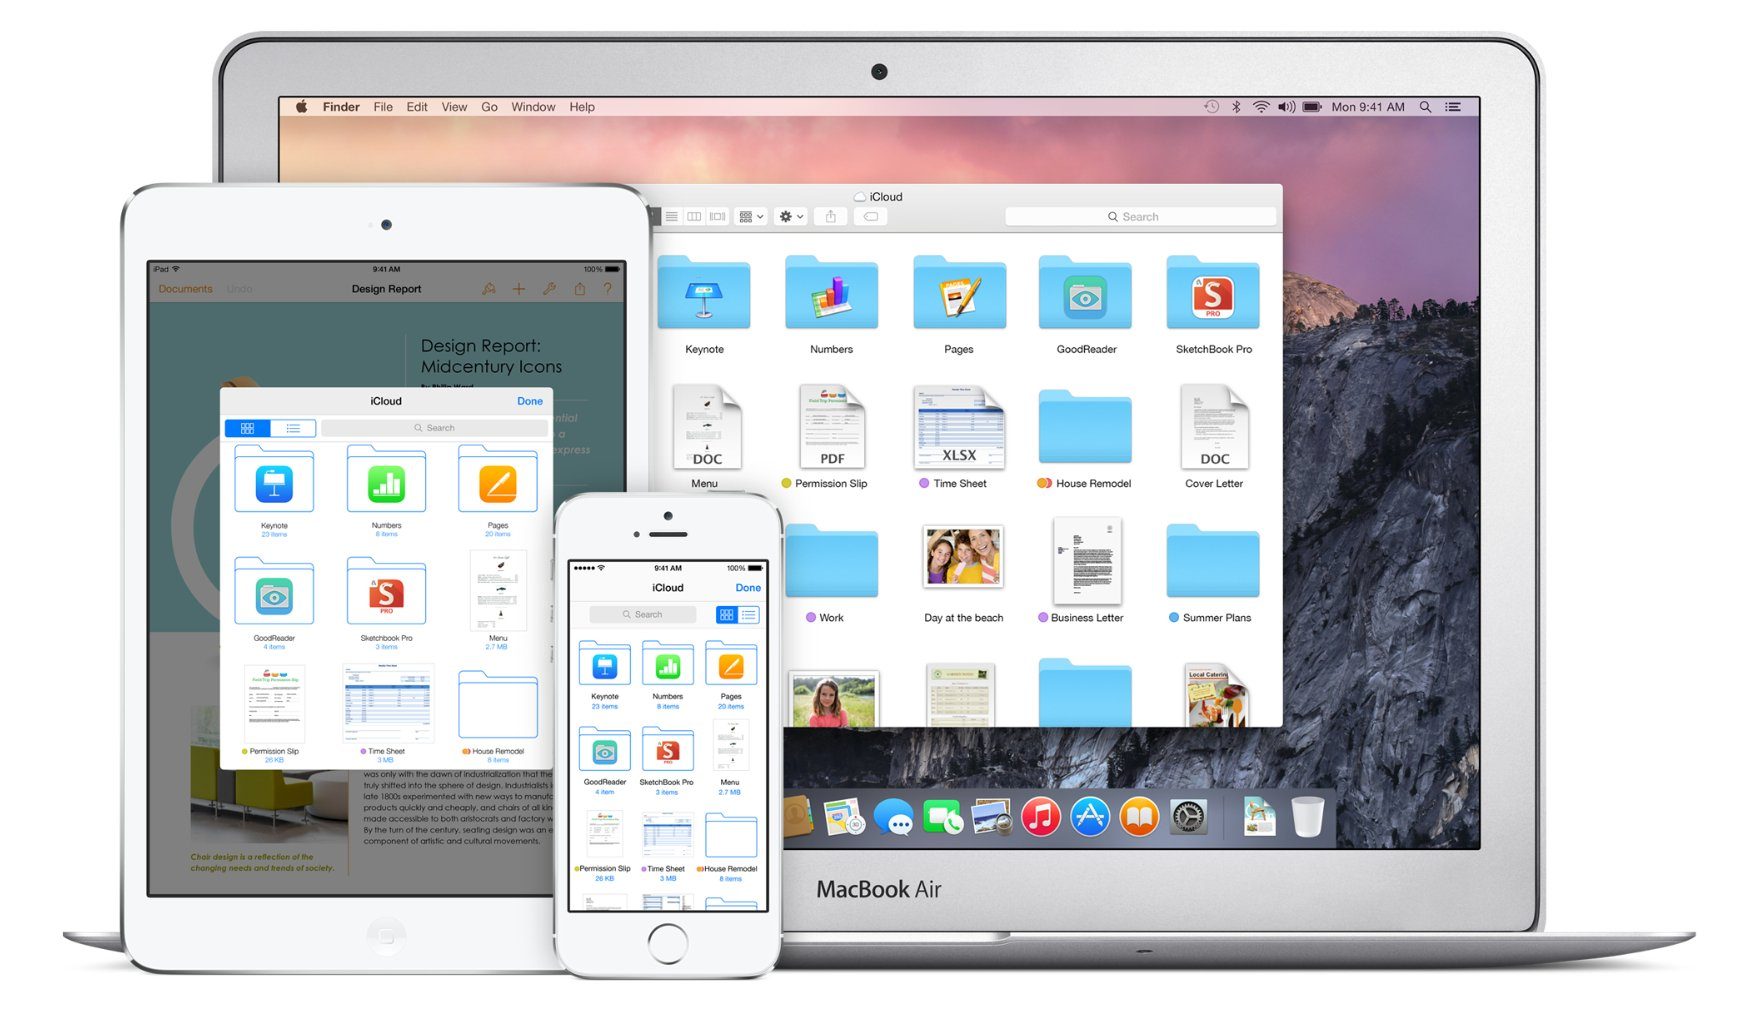 Apple– iOS8– iCloudDrive 2014-09-22 15-21-27 2014-09-22 15-21-28